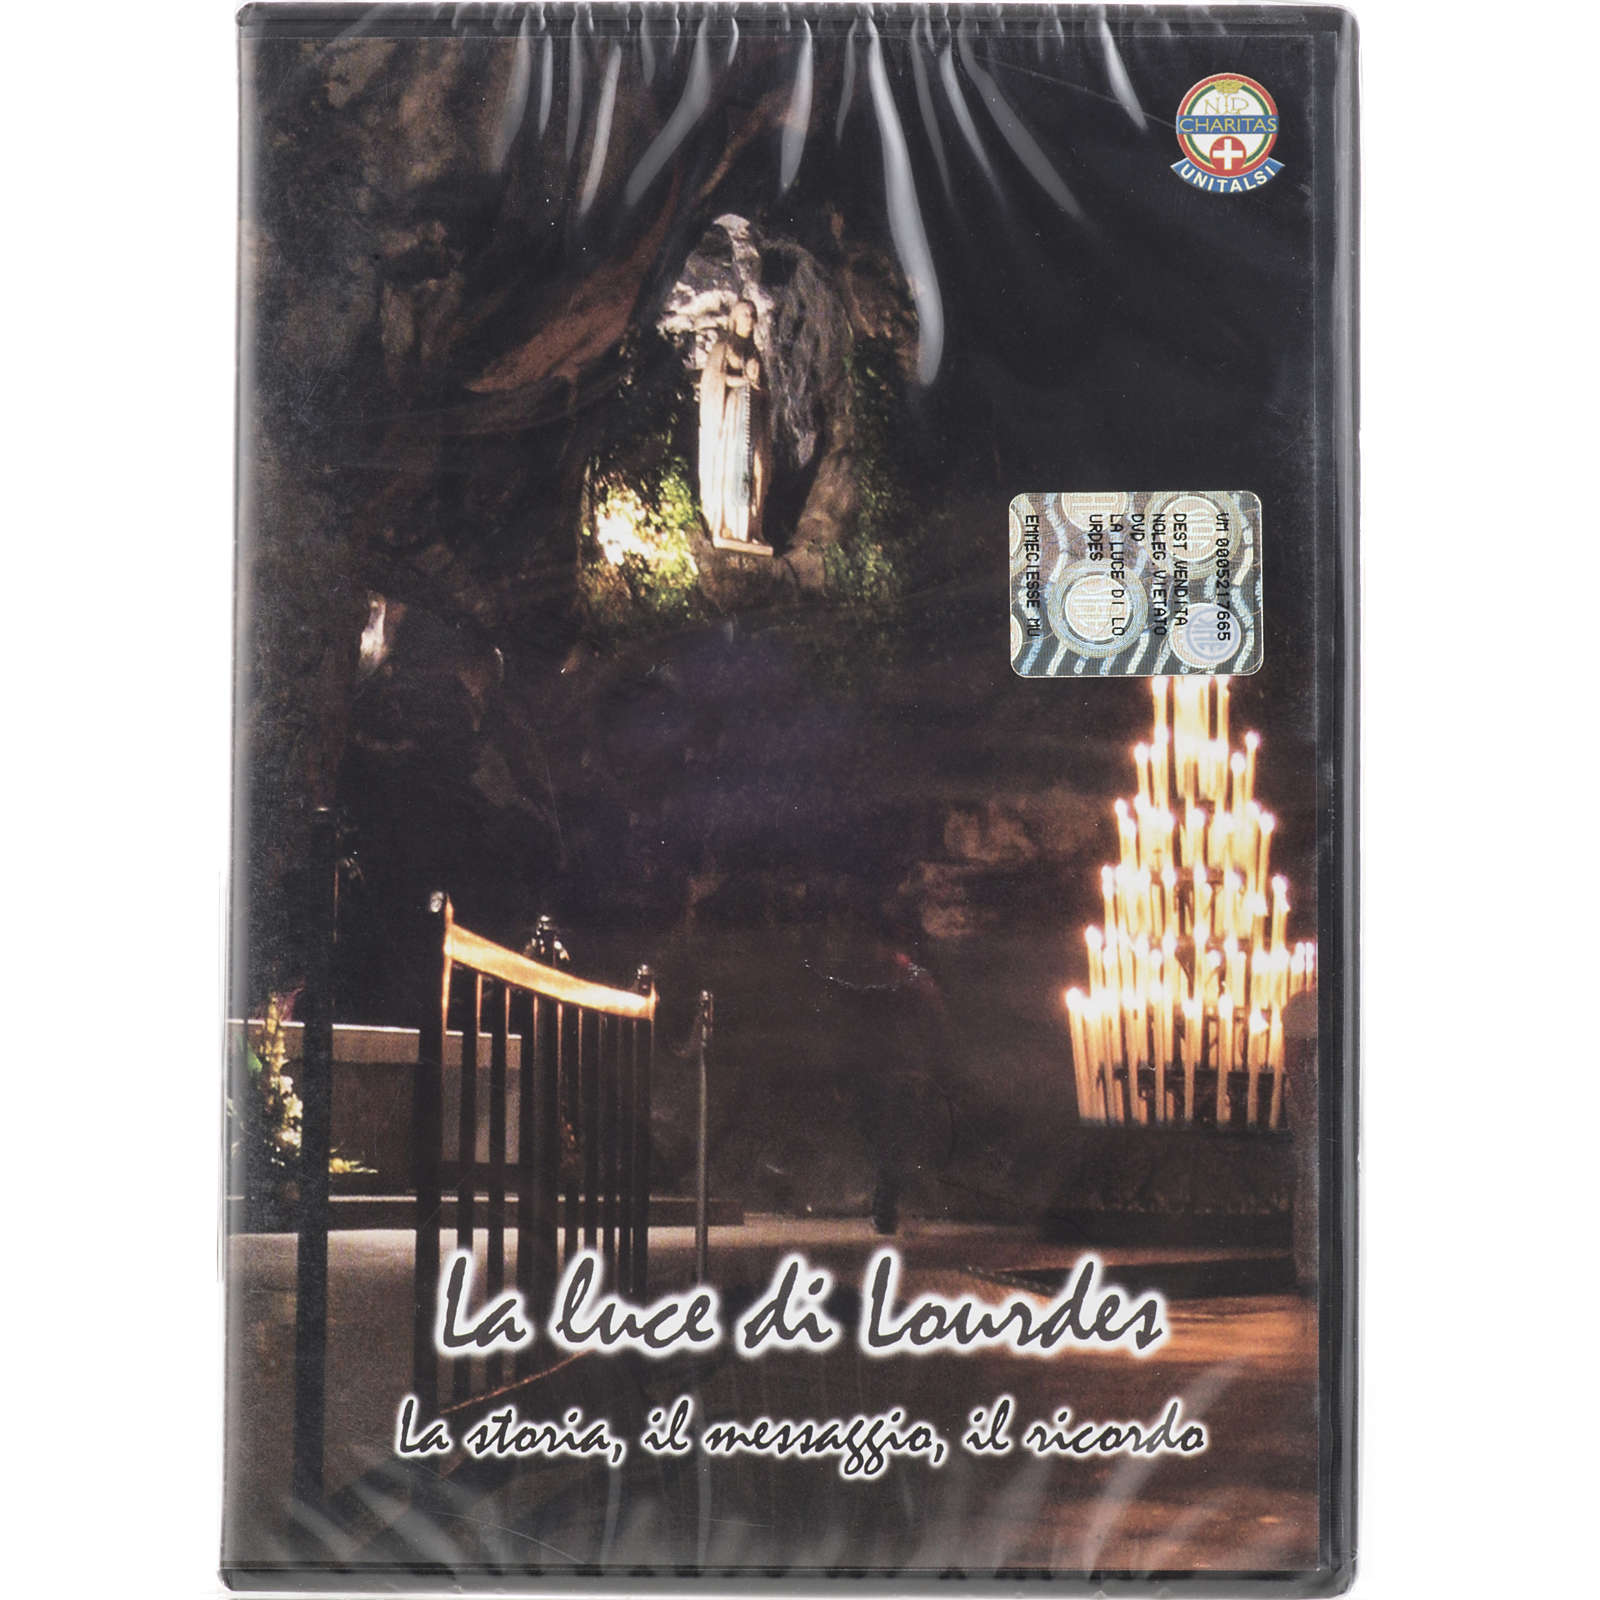 La luce di Lourdes 3